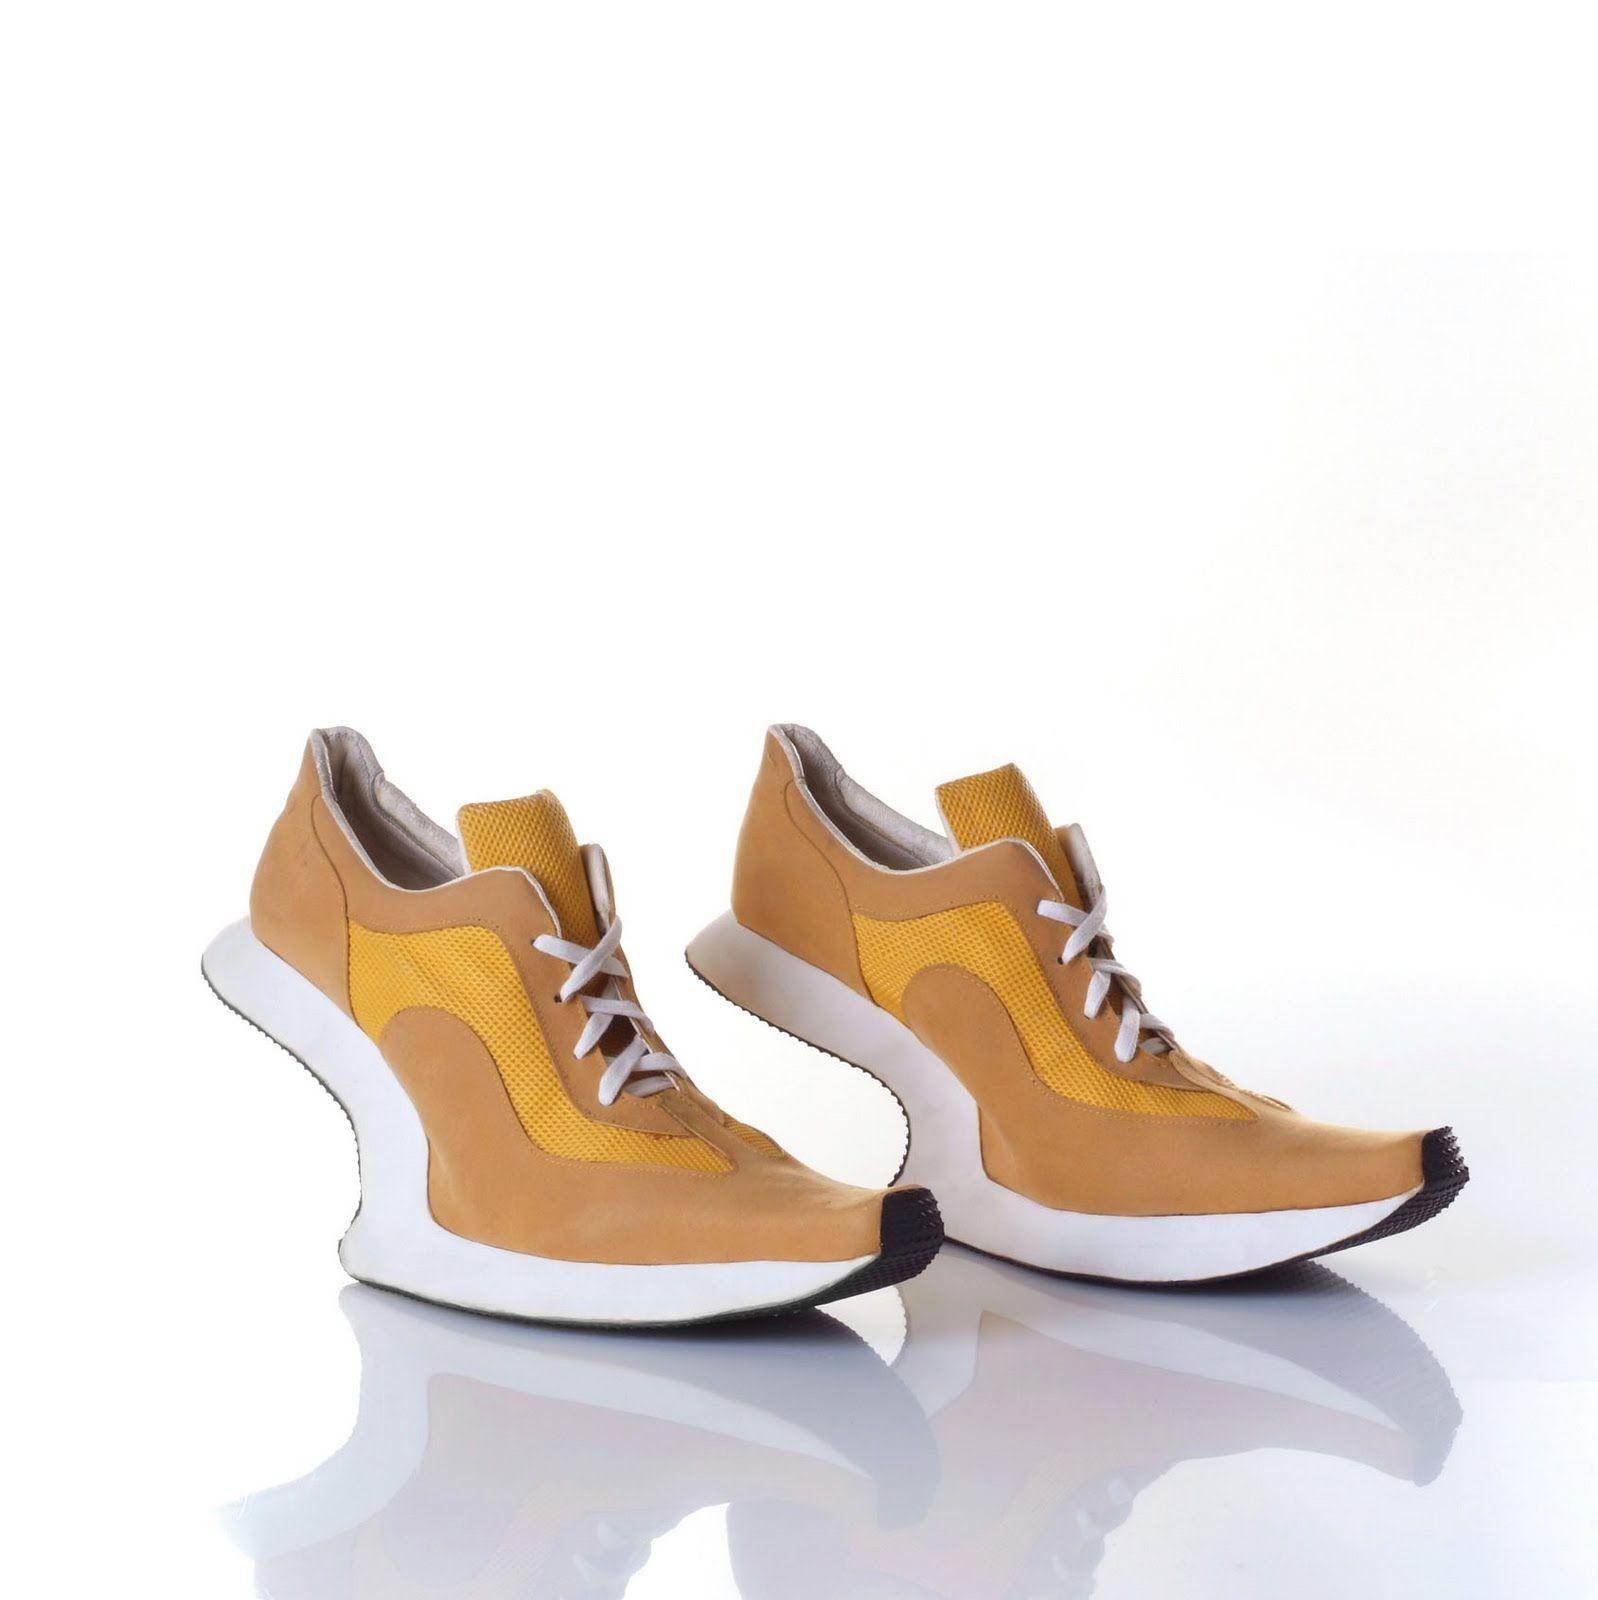 Artistic Footwear Designs By Kobi Levi Inspiration Shoes